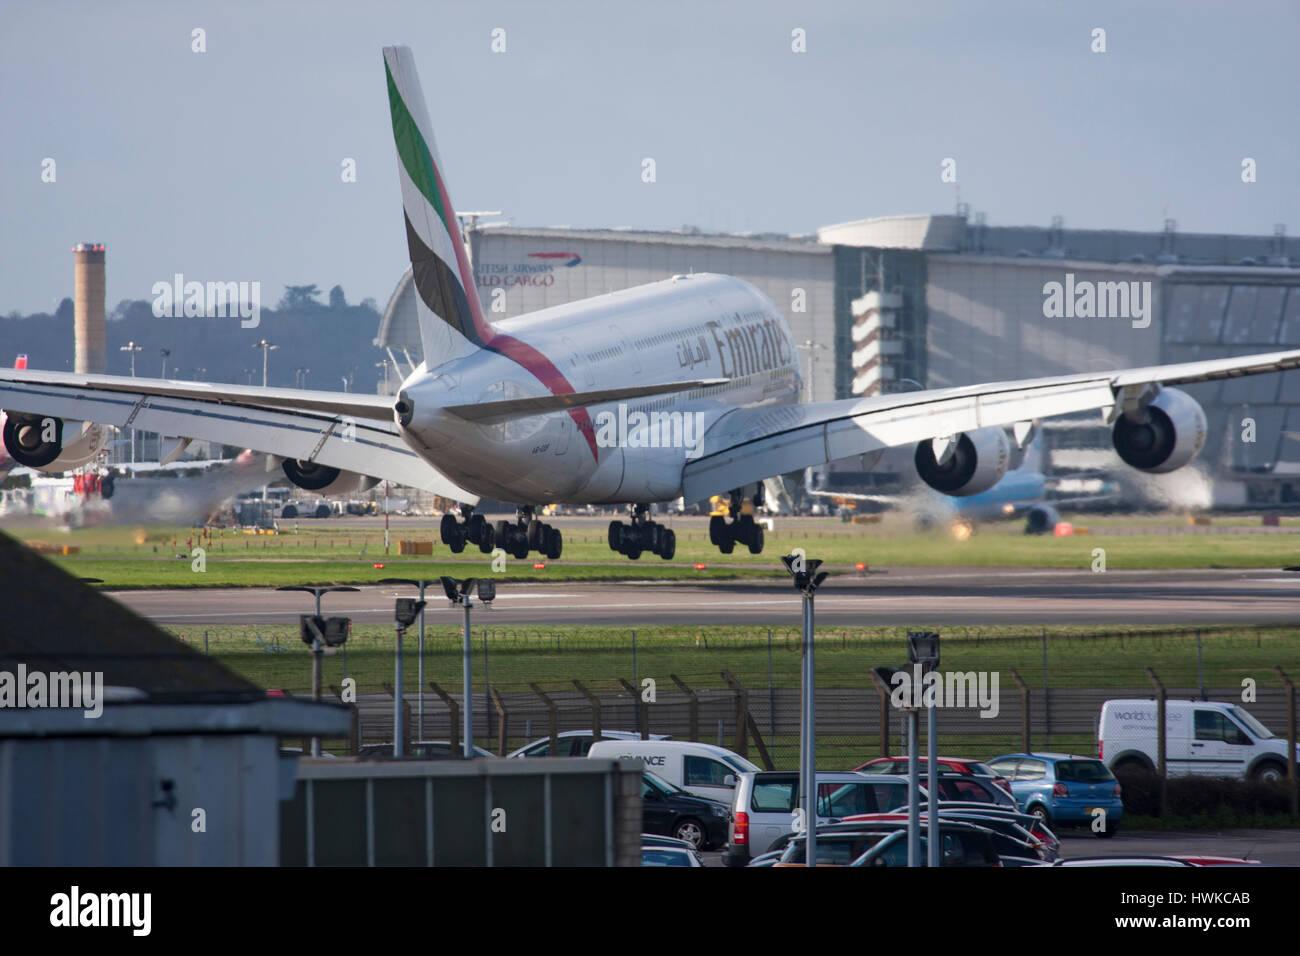 Emirates Airbus A380-861 landing at London Heathrow Airport, UK - Stock Image